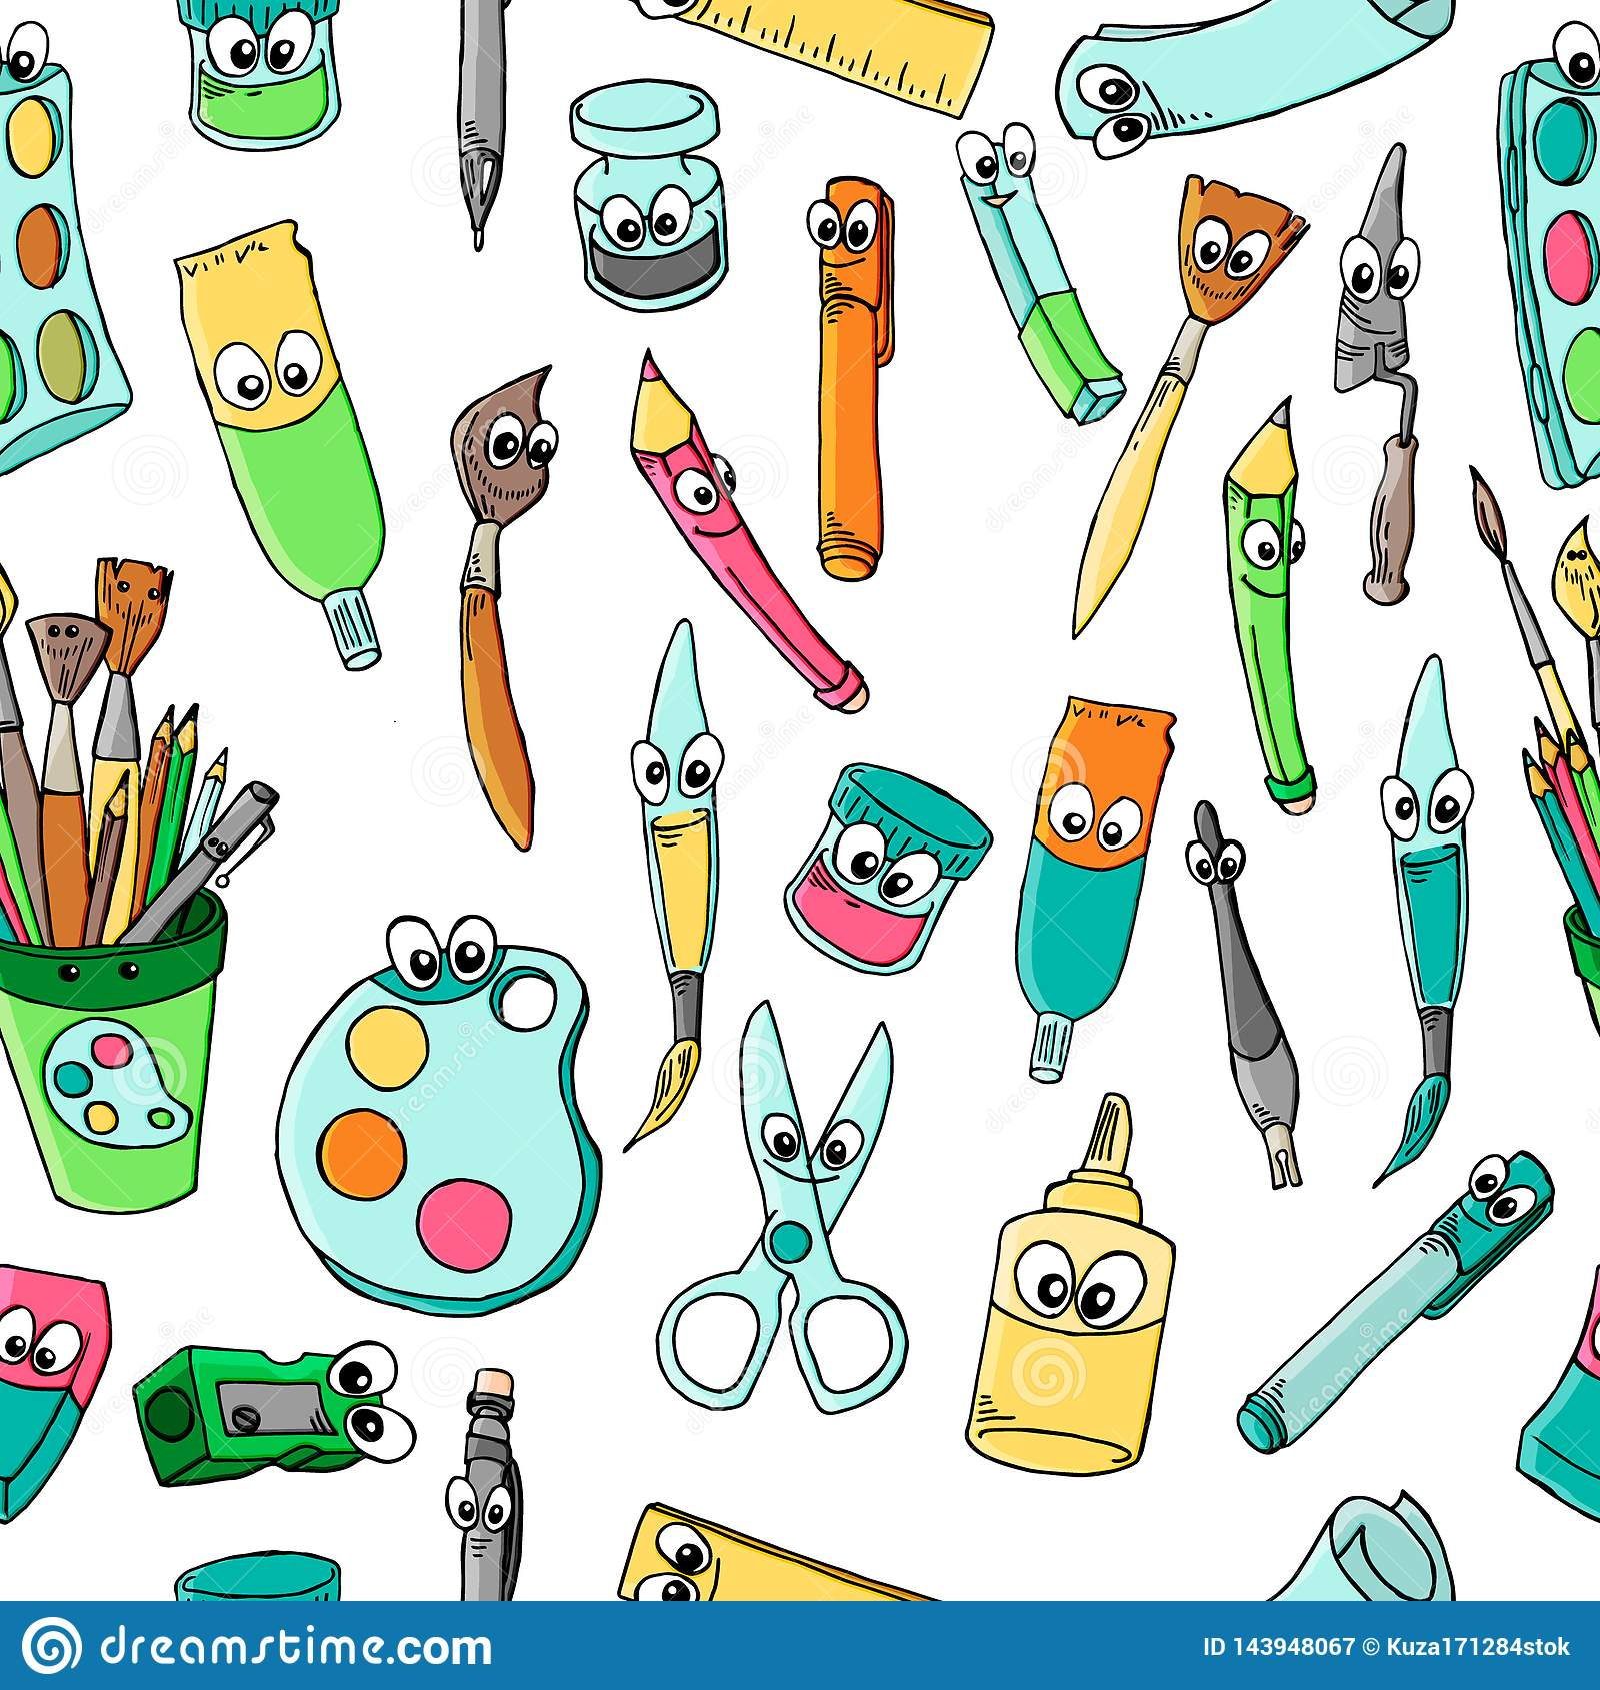 School Of Cartoon Characters Stationery: Pencil, Ball Pen